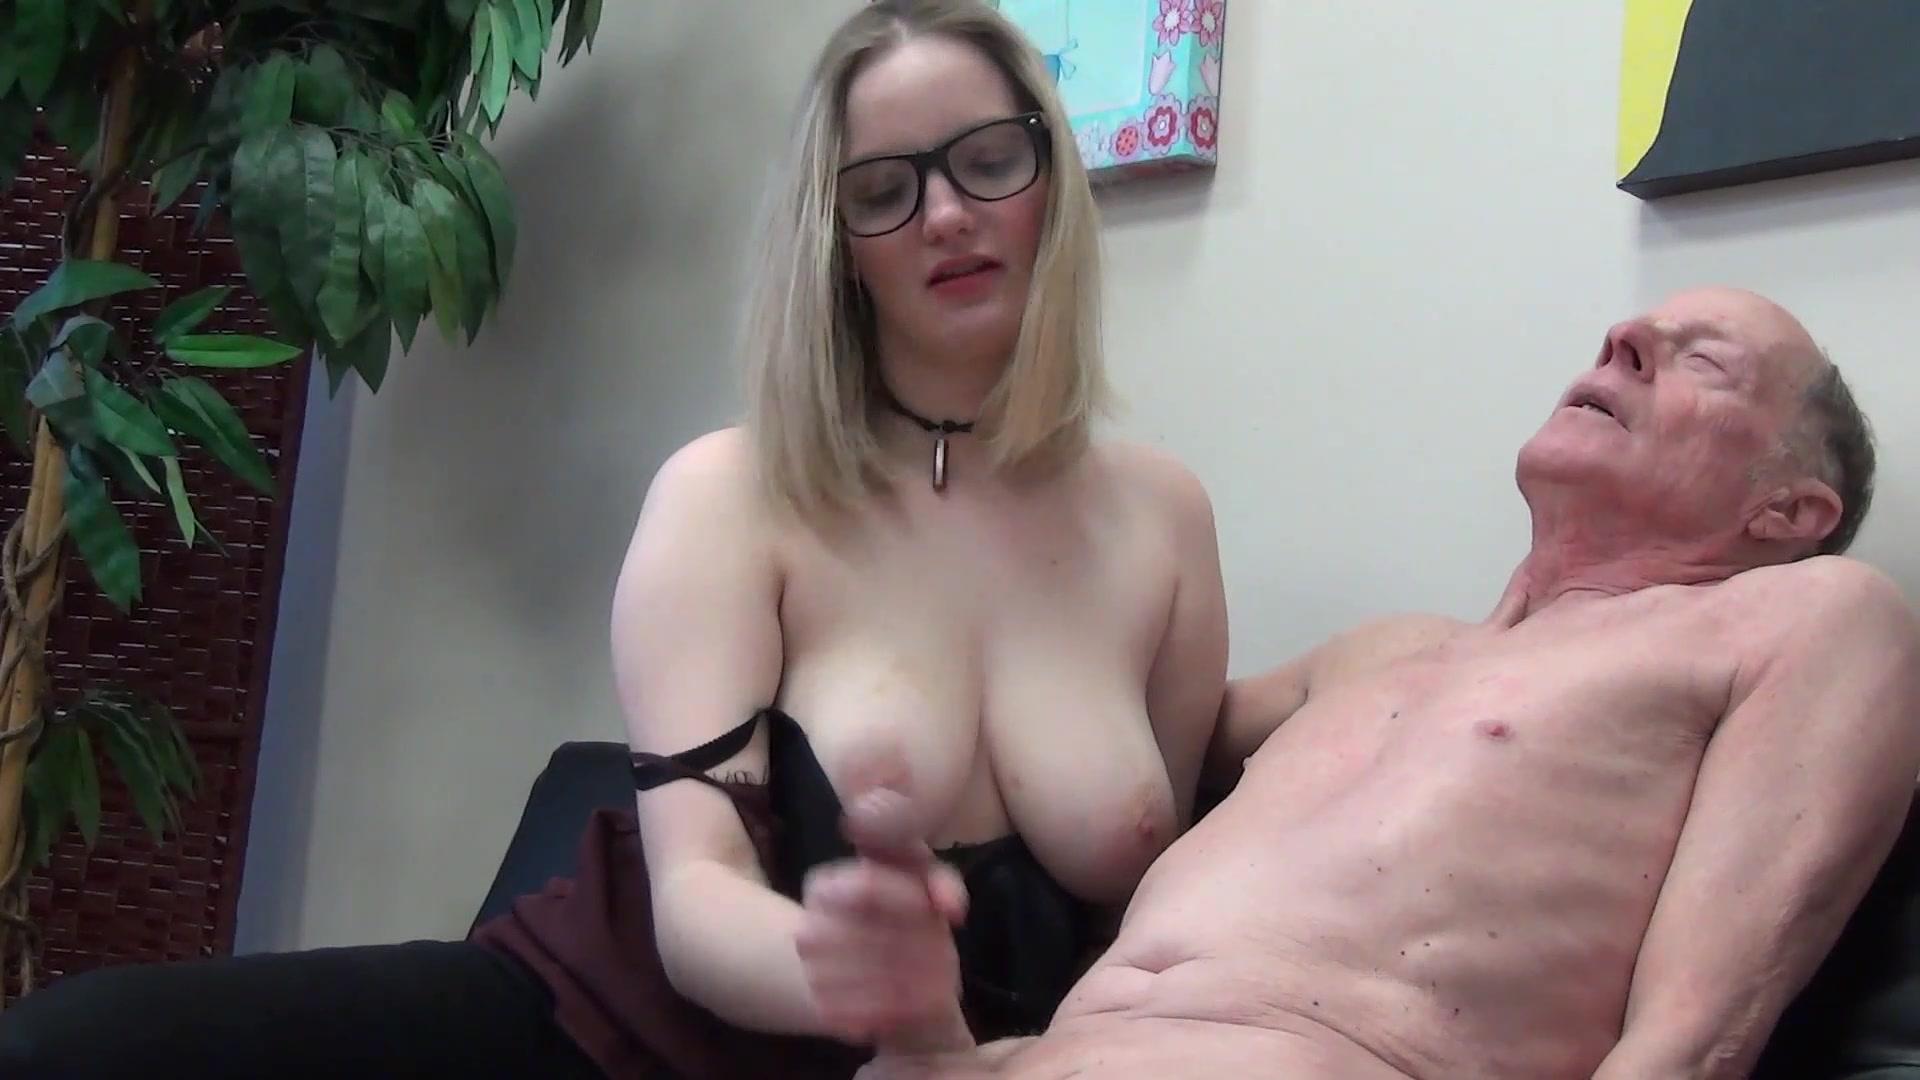 Jerky Girls Big Young Tits XXX Premium Manyvids Porn Pics